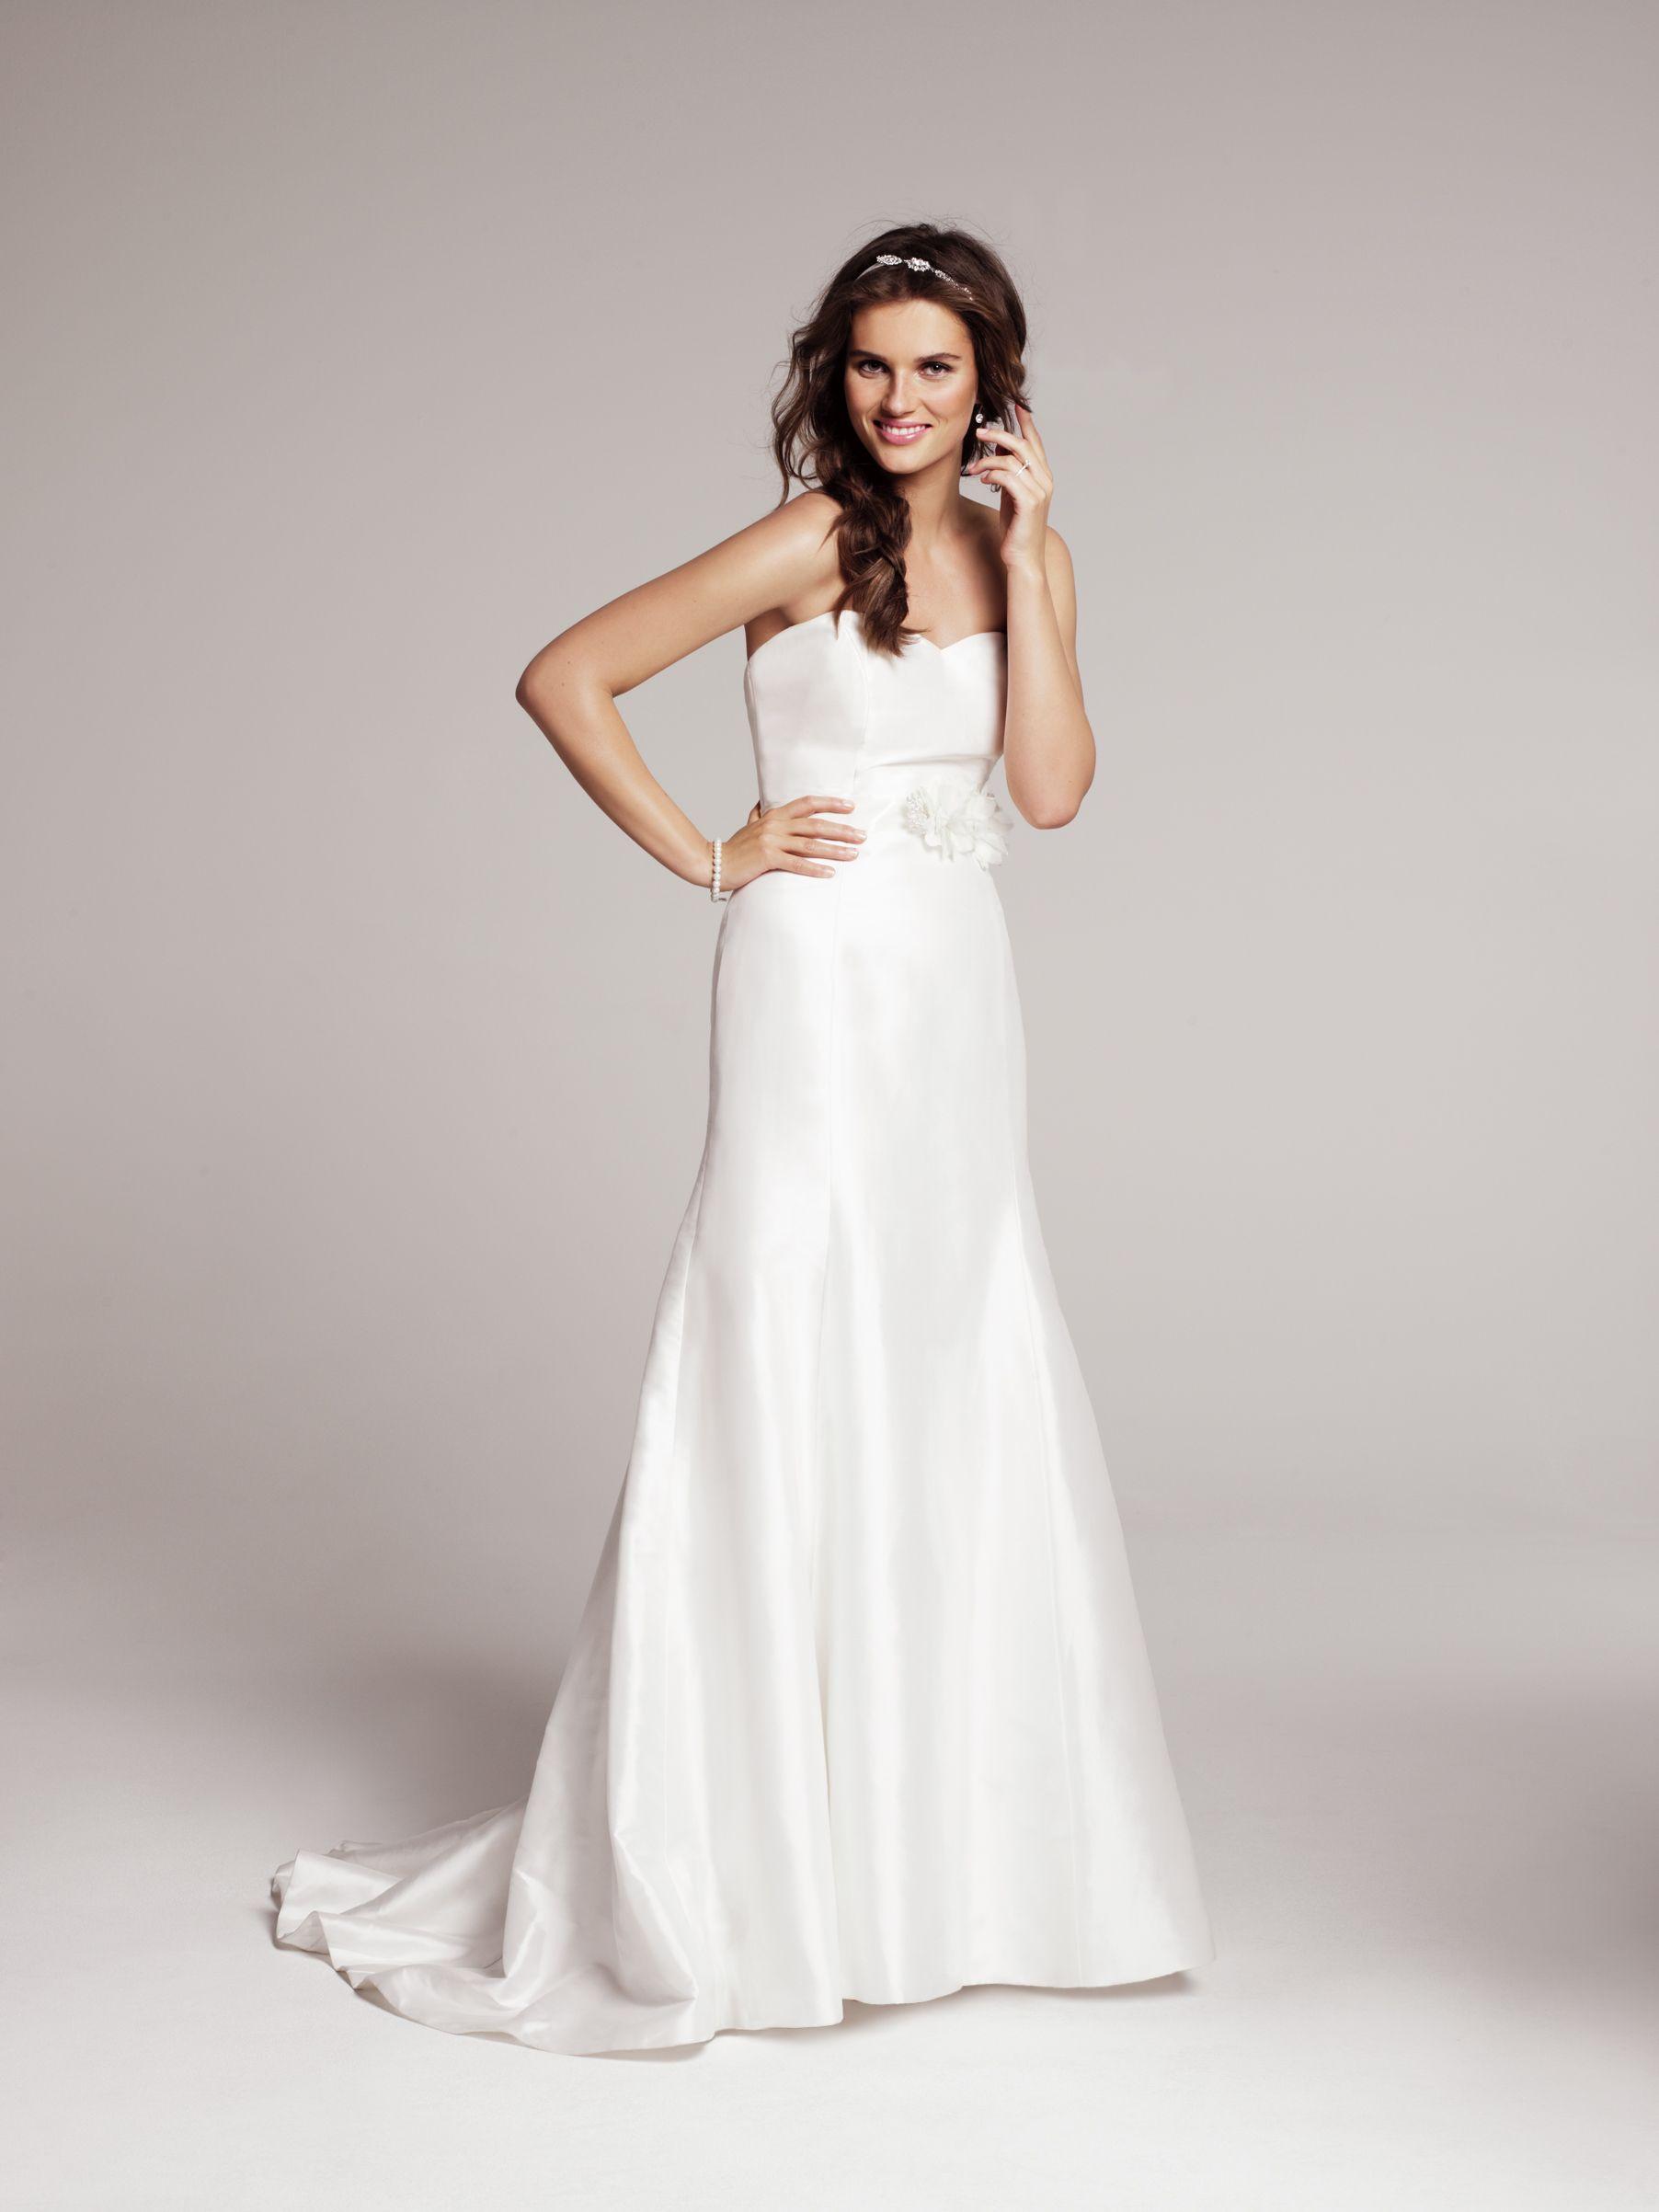 nordstrom wedding dresses Heidi Elnora Coco Marie Strapless Silk Gown Nordstrom